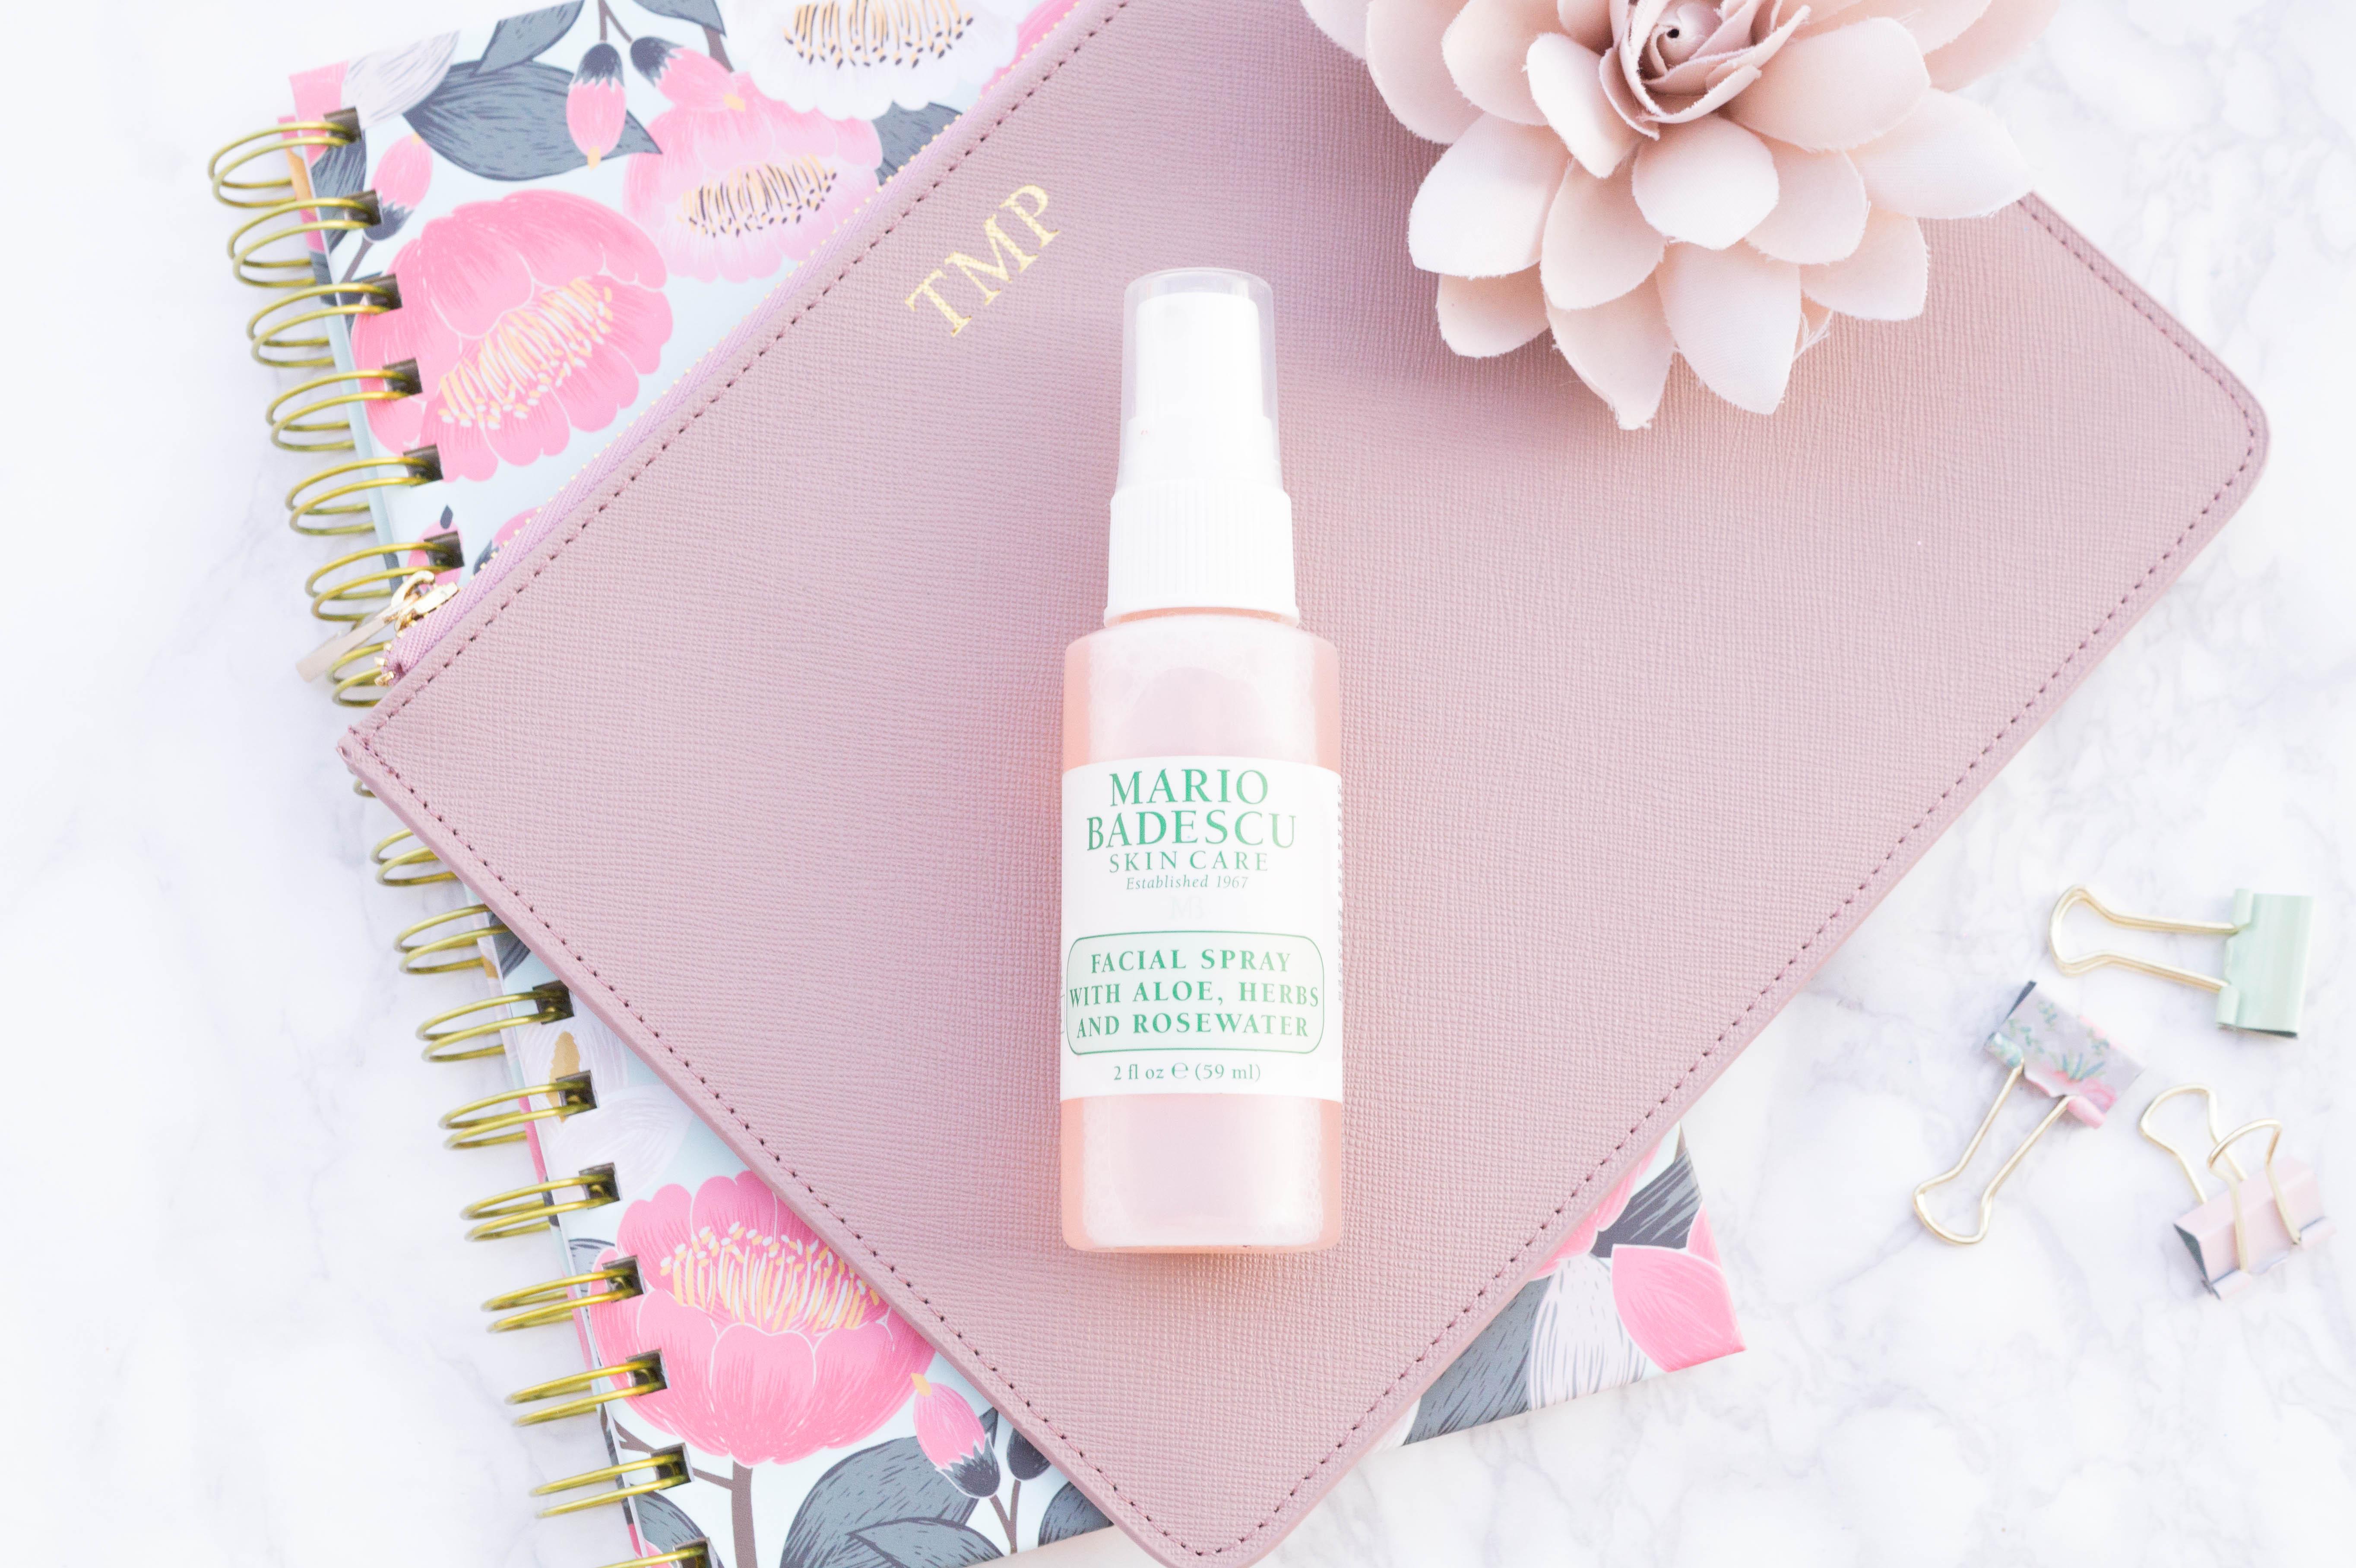 skincare dry skin skin hautpflege dehydrated skin flatlay beauty blog